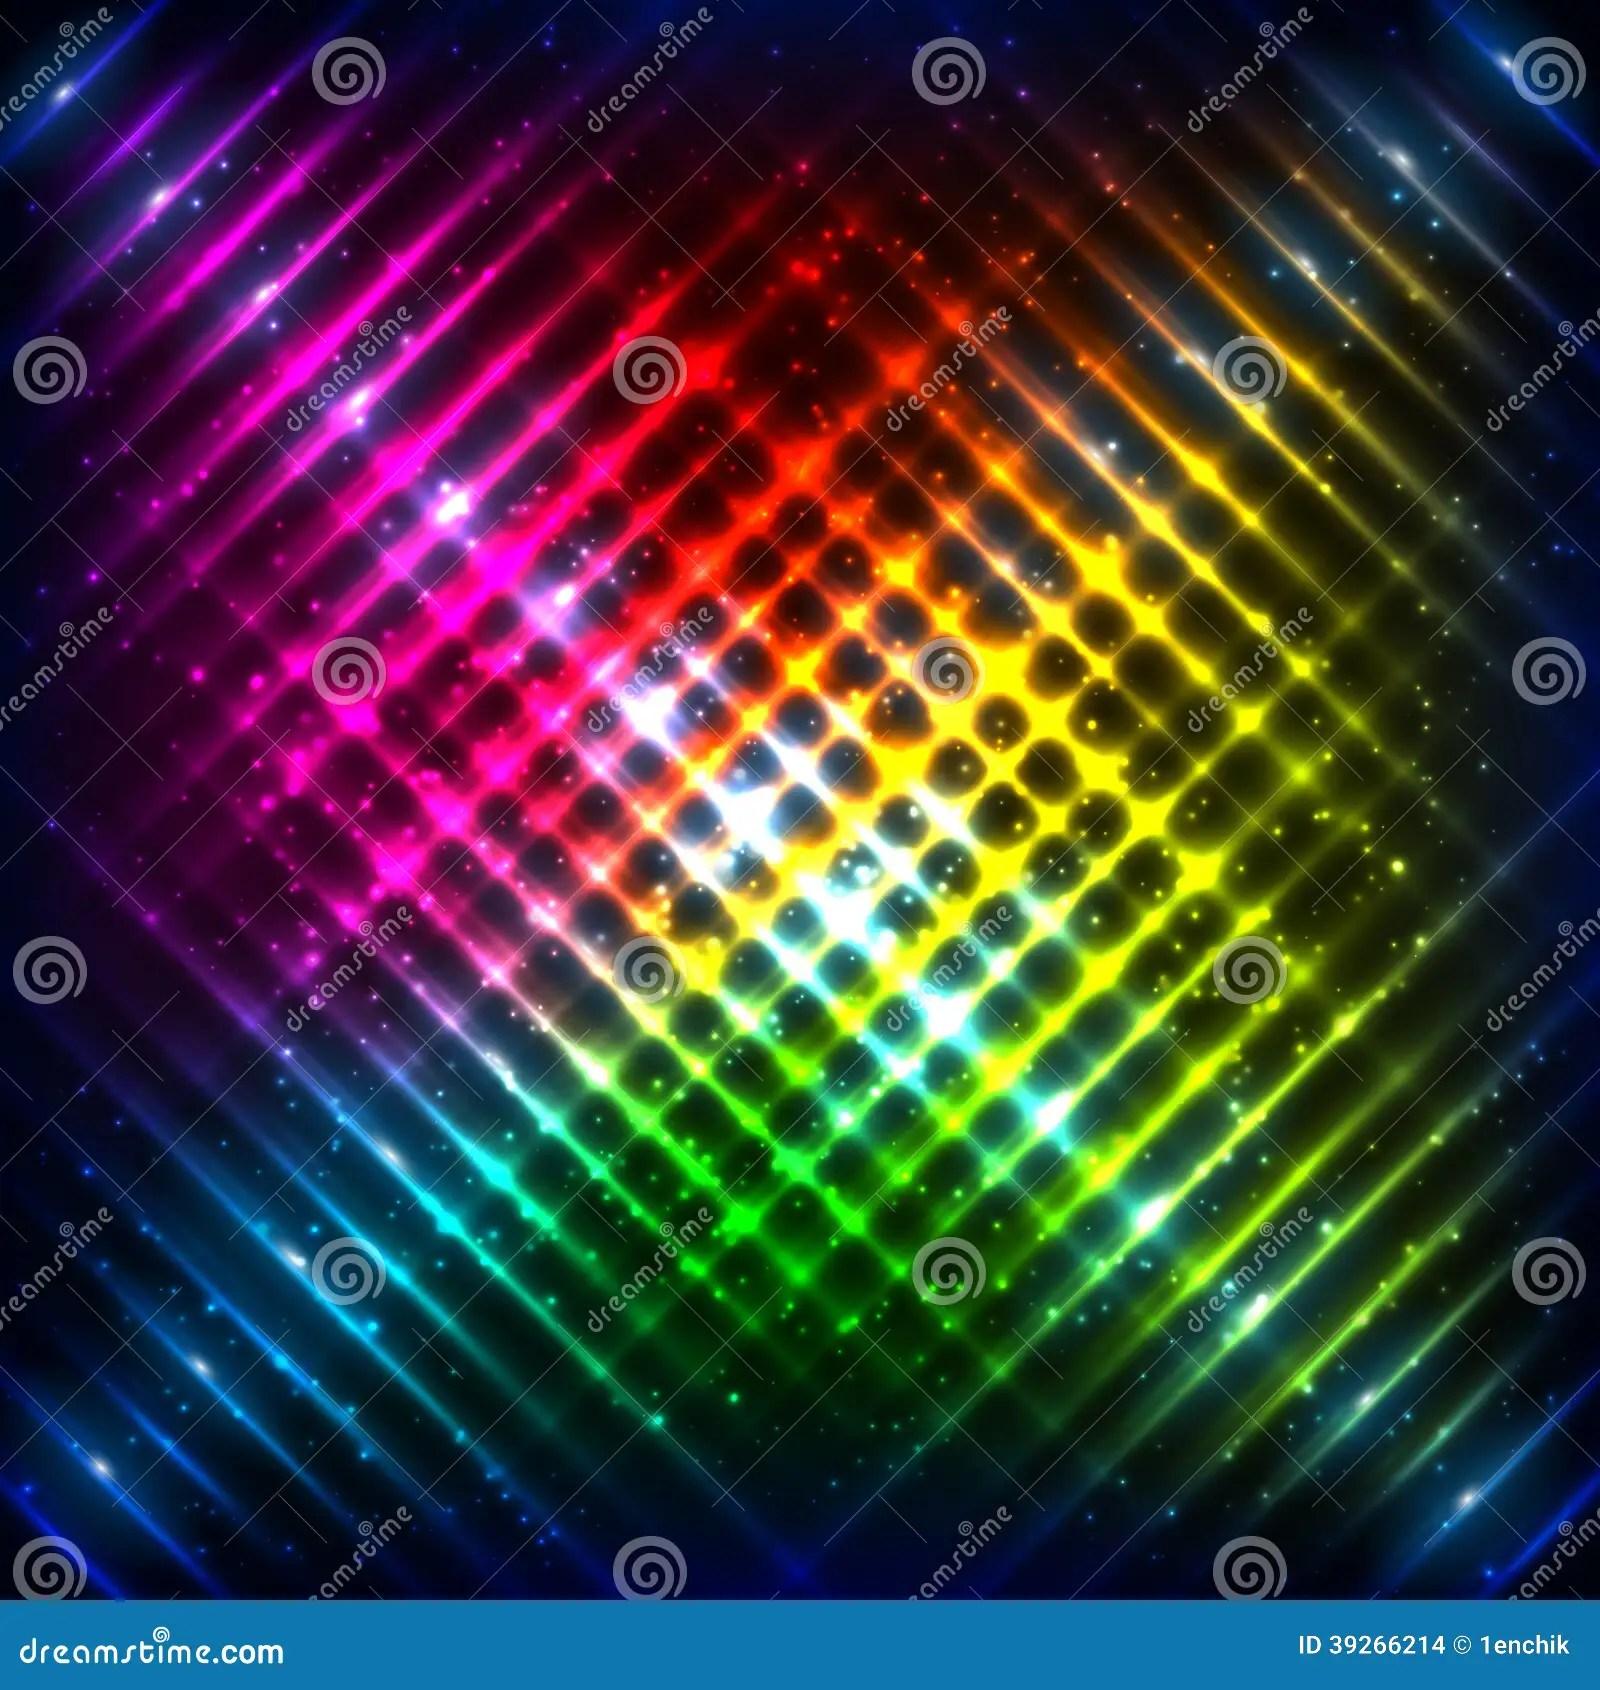 Grid Wallpaper Iphone X Rainbow Neon Grid Vector Background Stock Vector Image